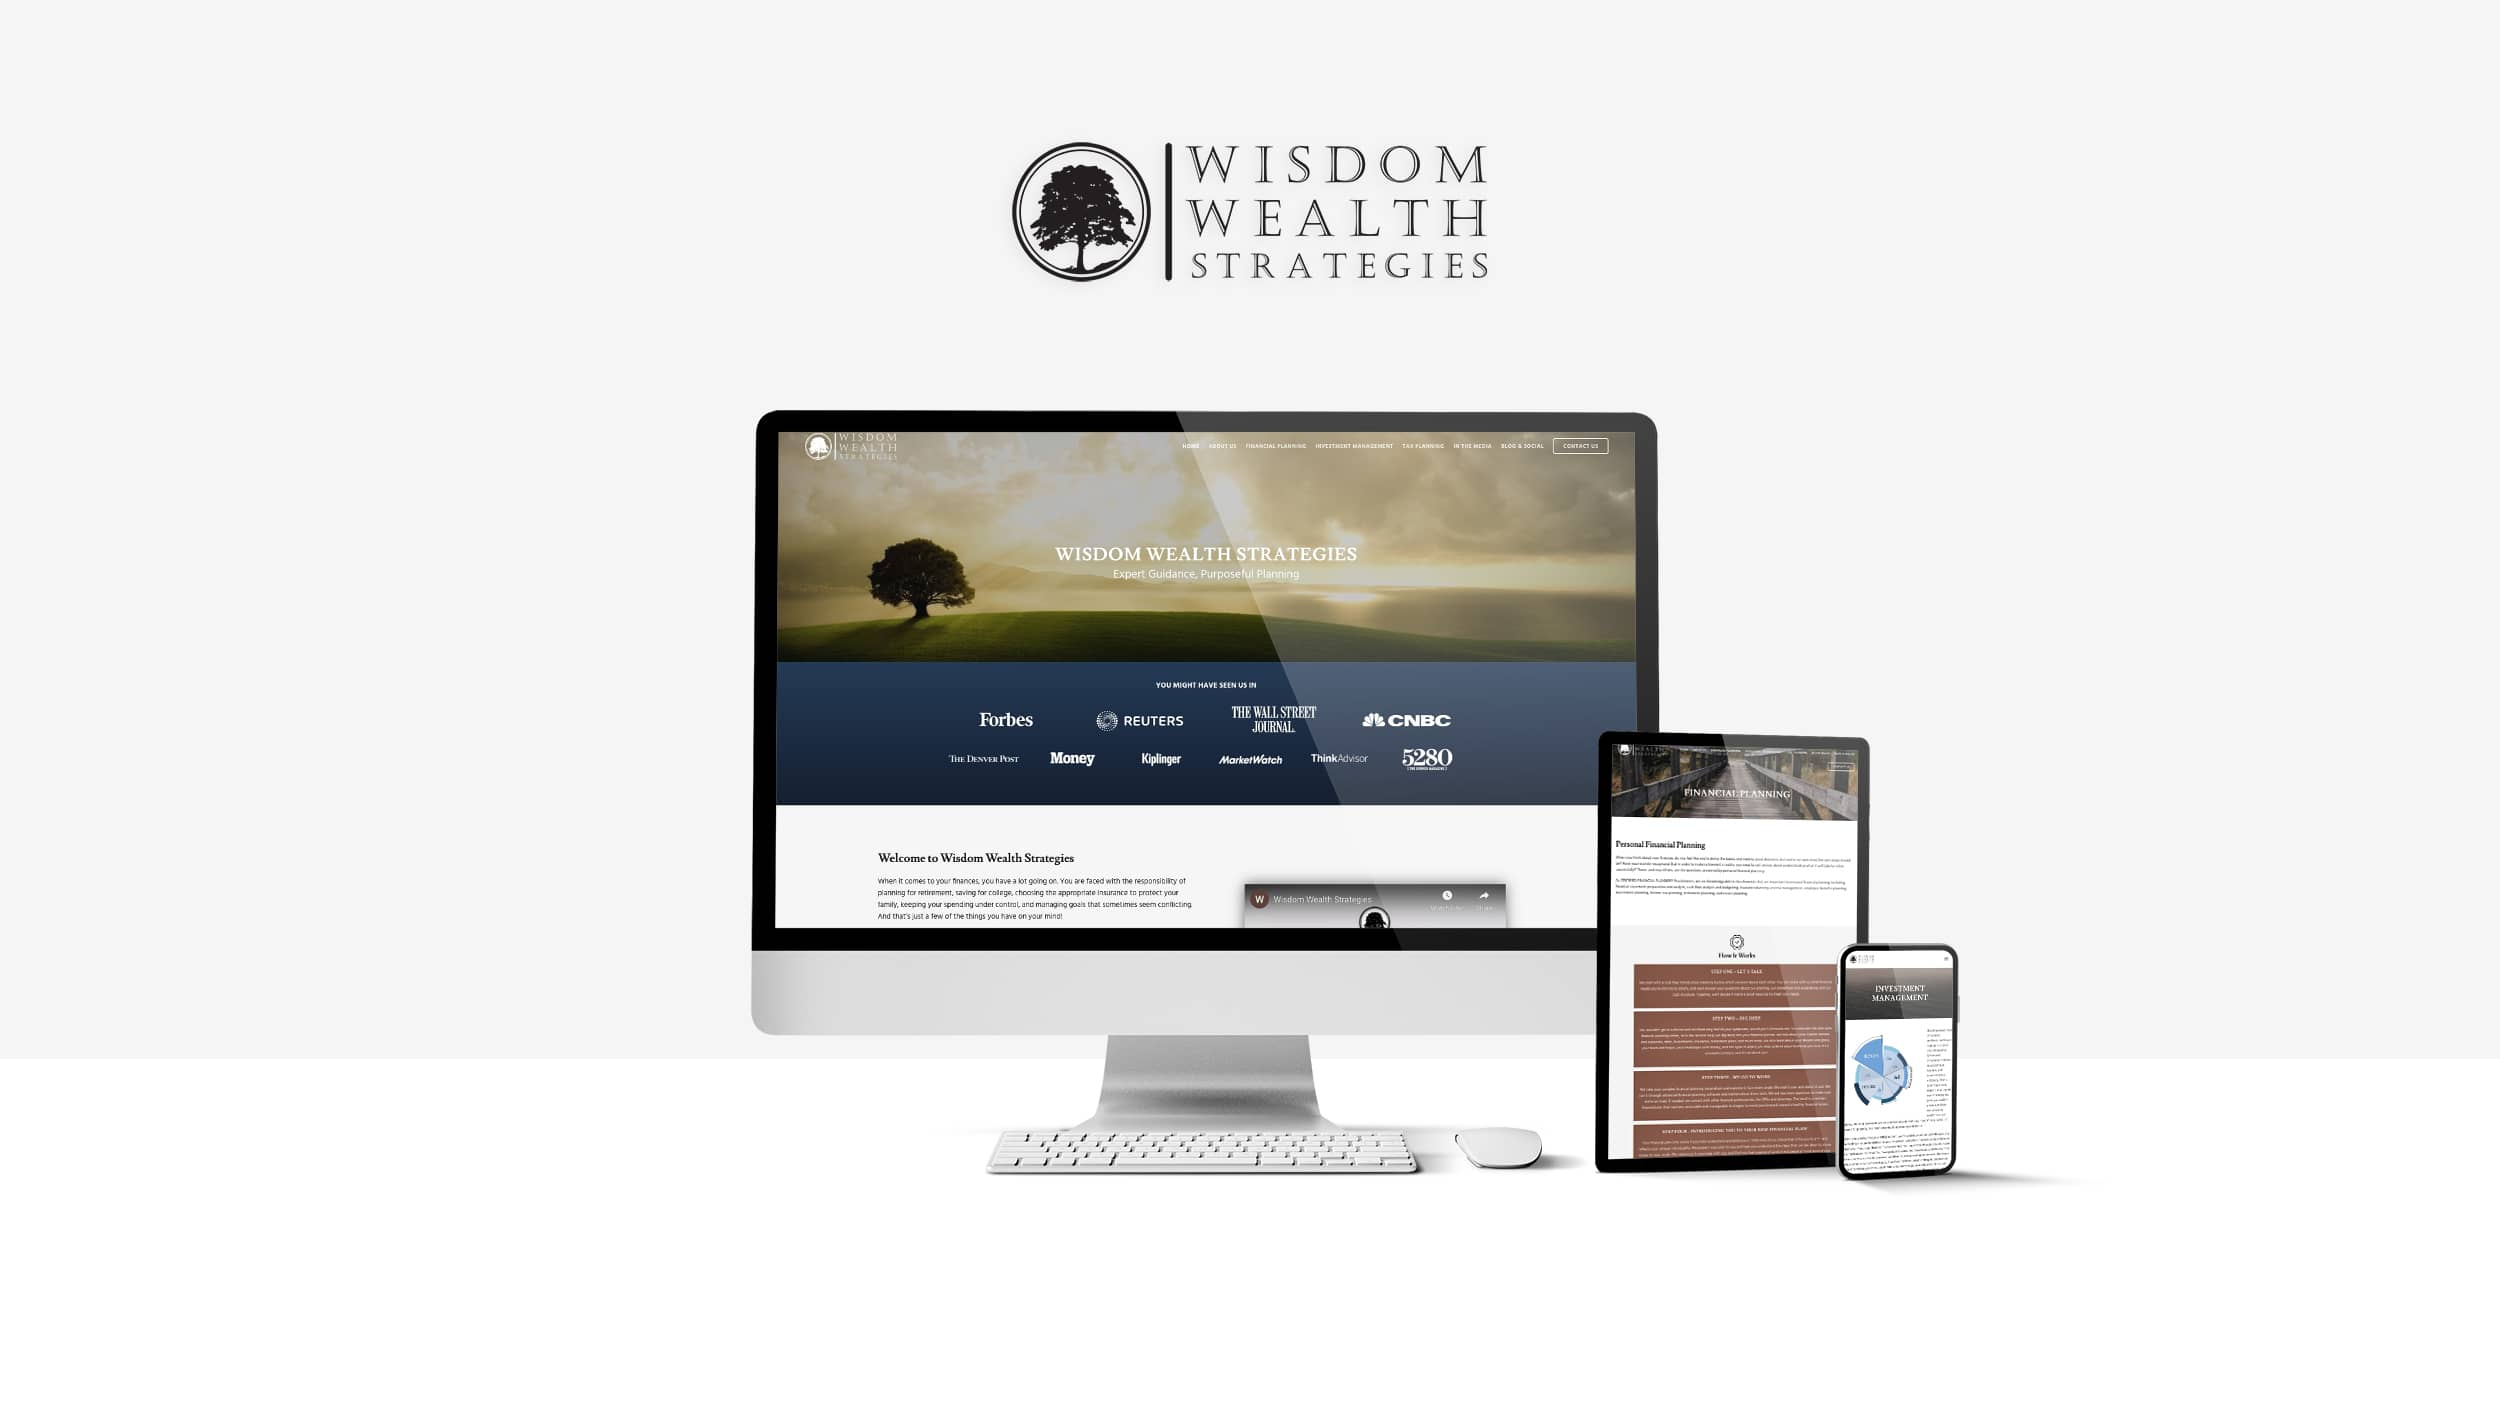 Wisdom Wealth Strategies Website on different device sizes